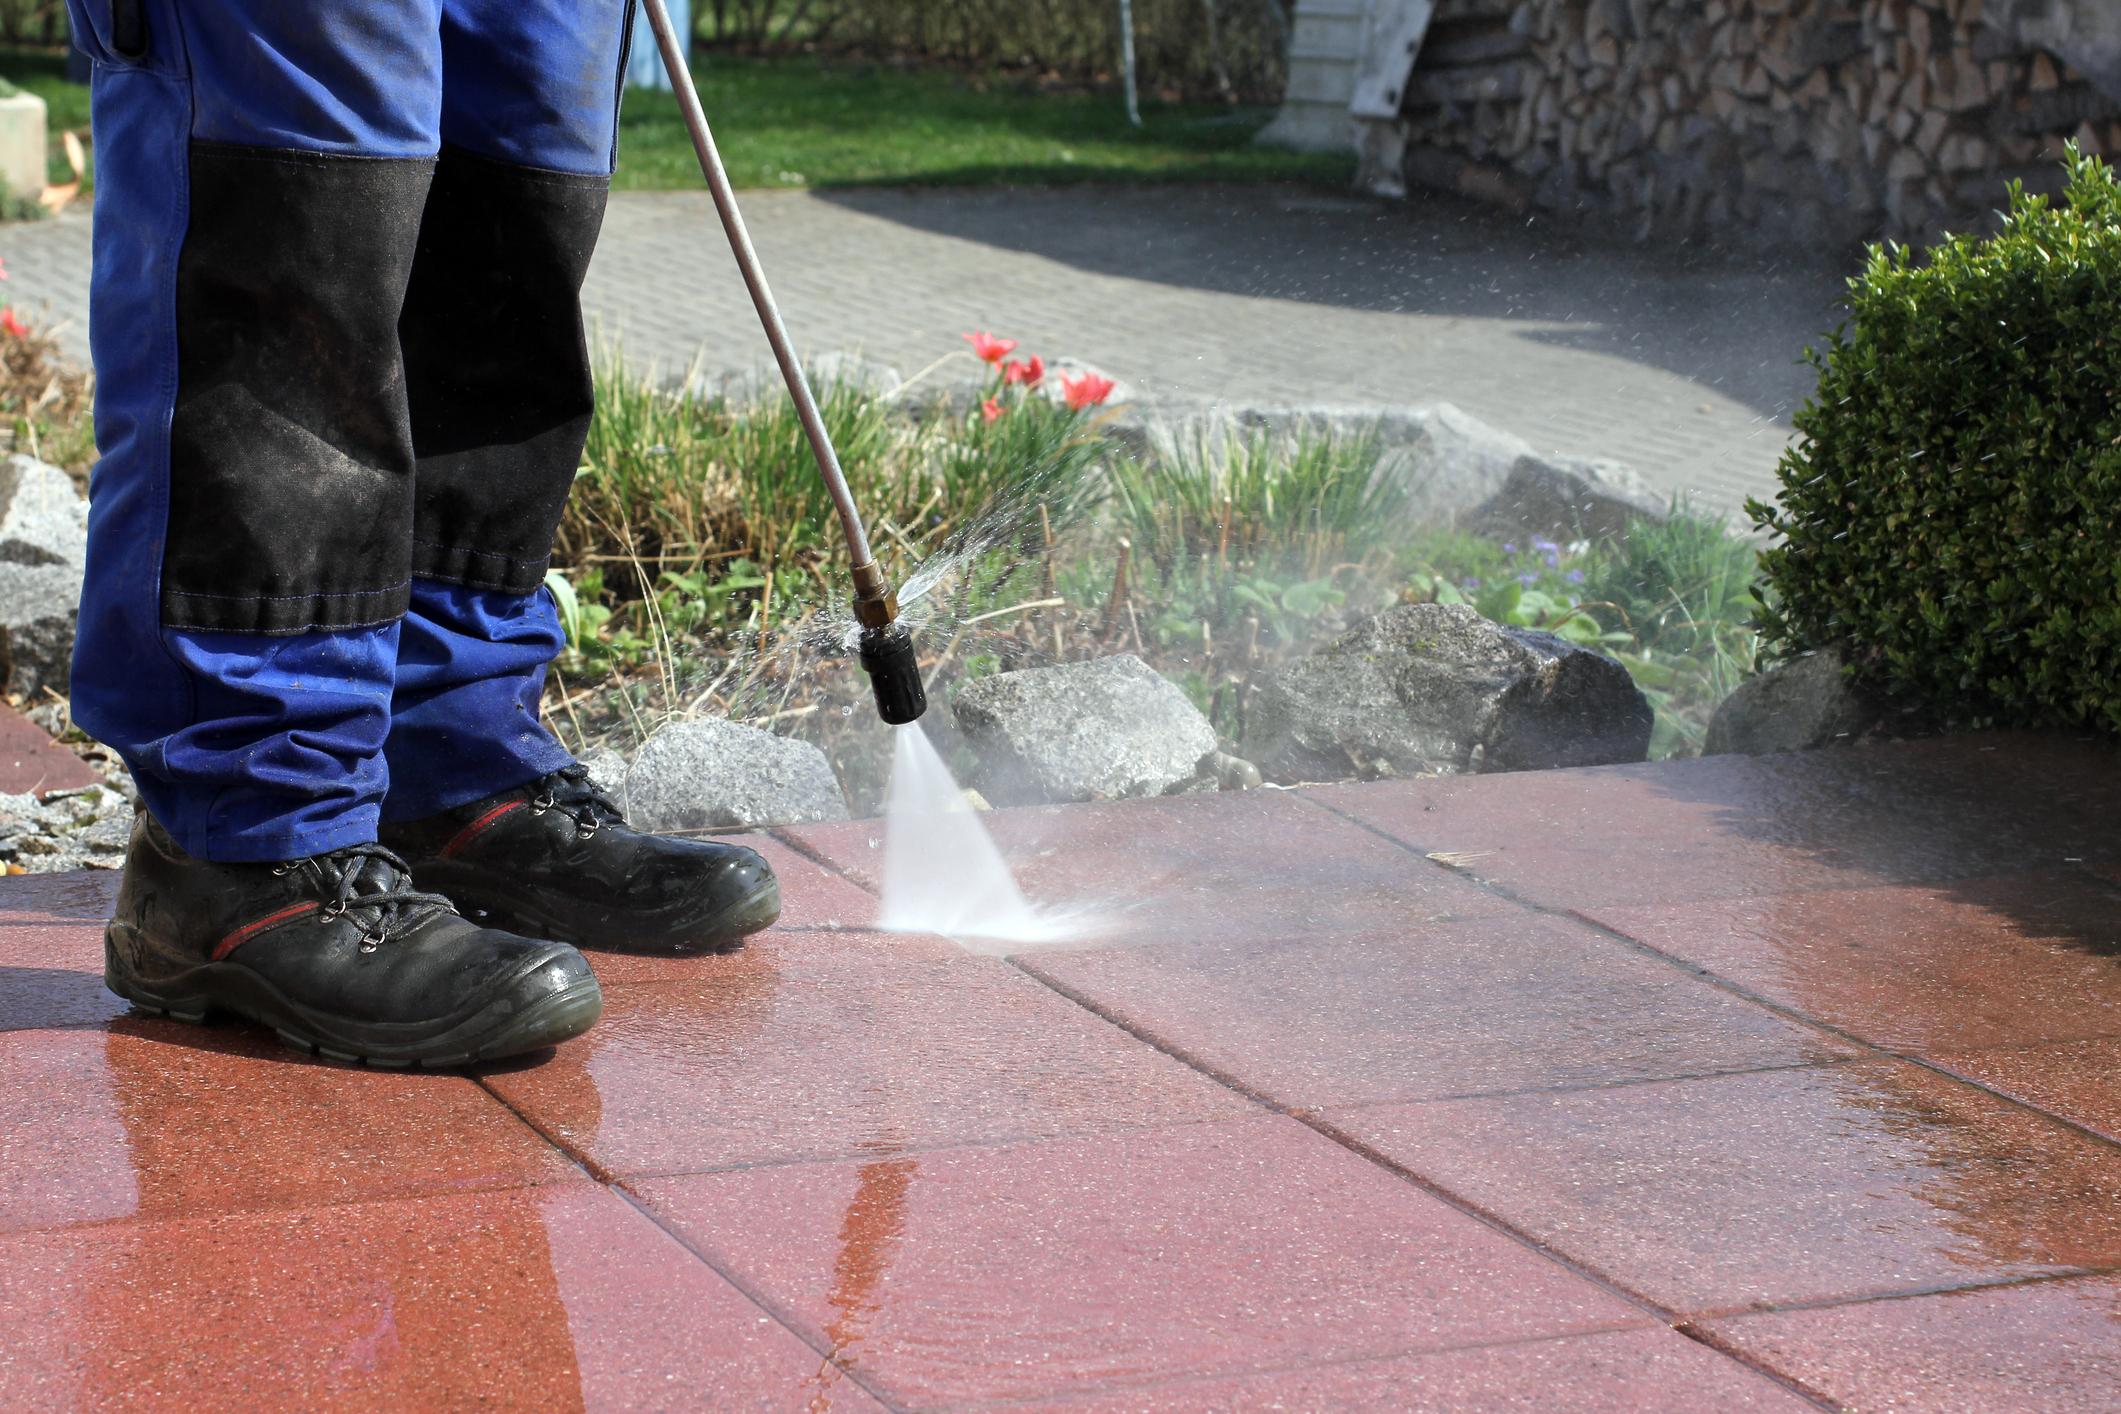 wash-rental-property-exterior-increase-property-value